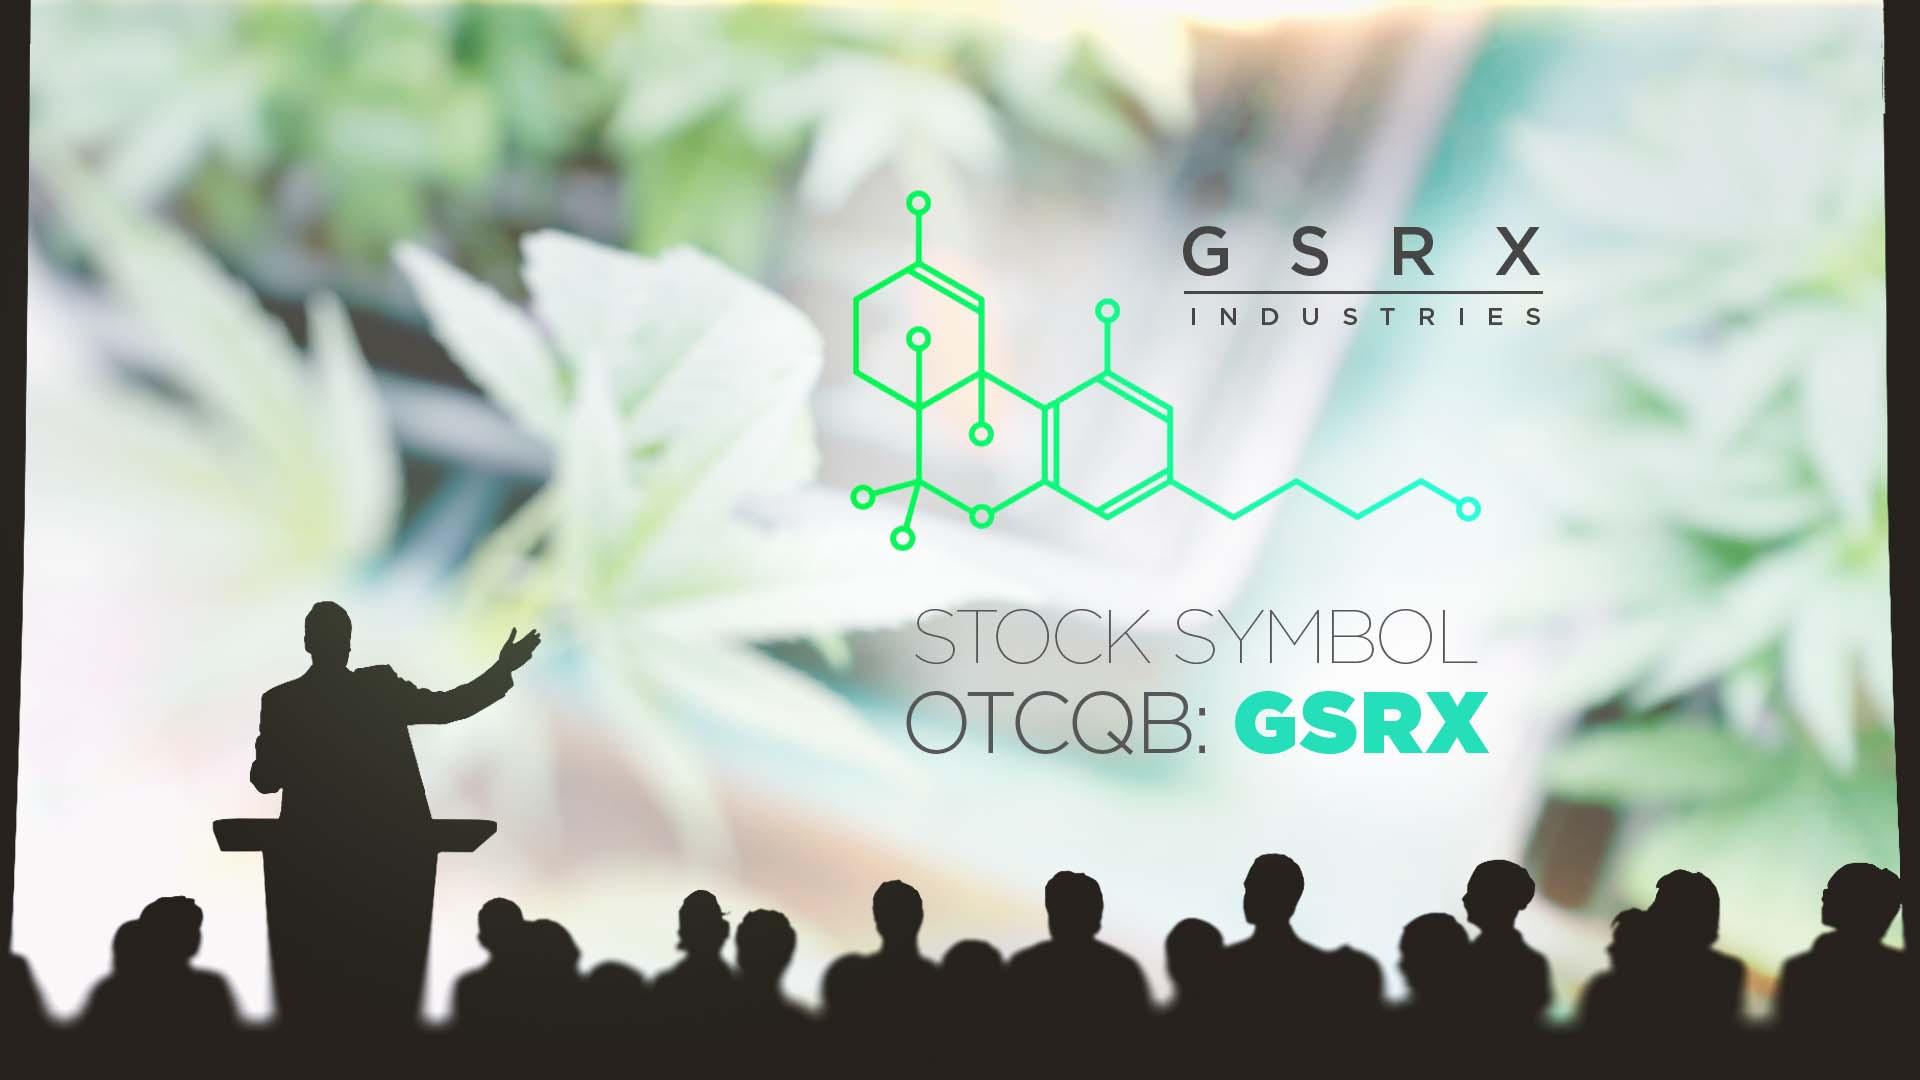 GSRX Industries Webinar